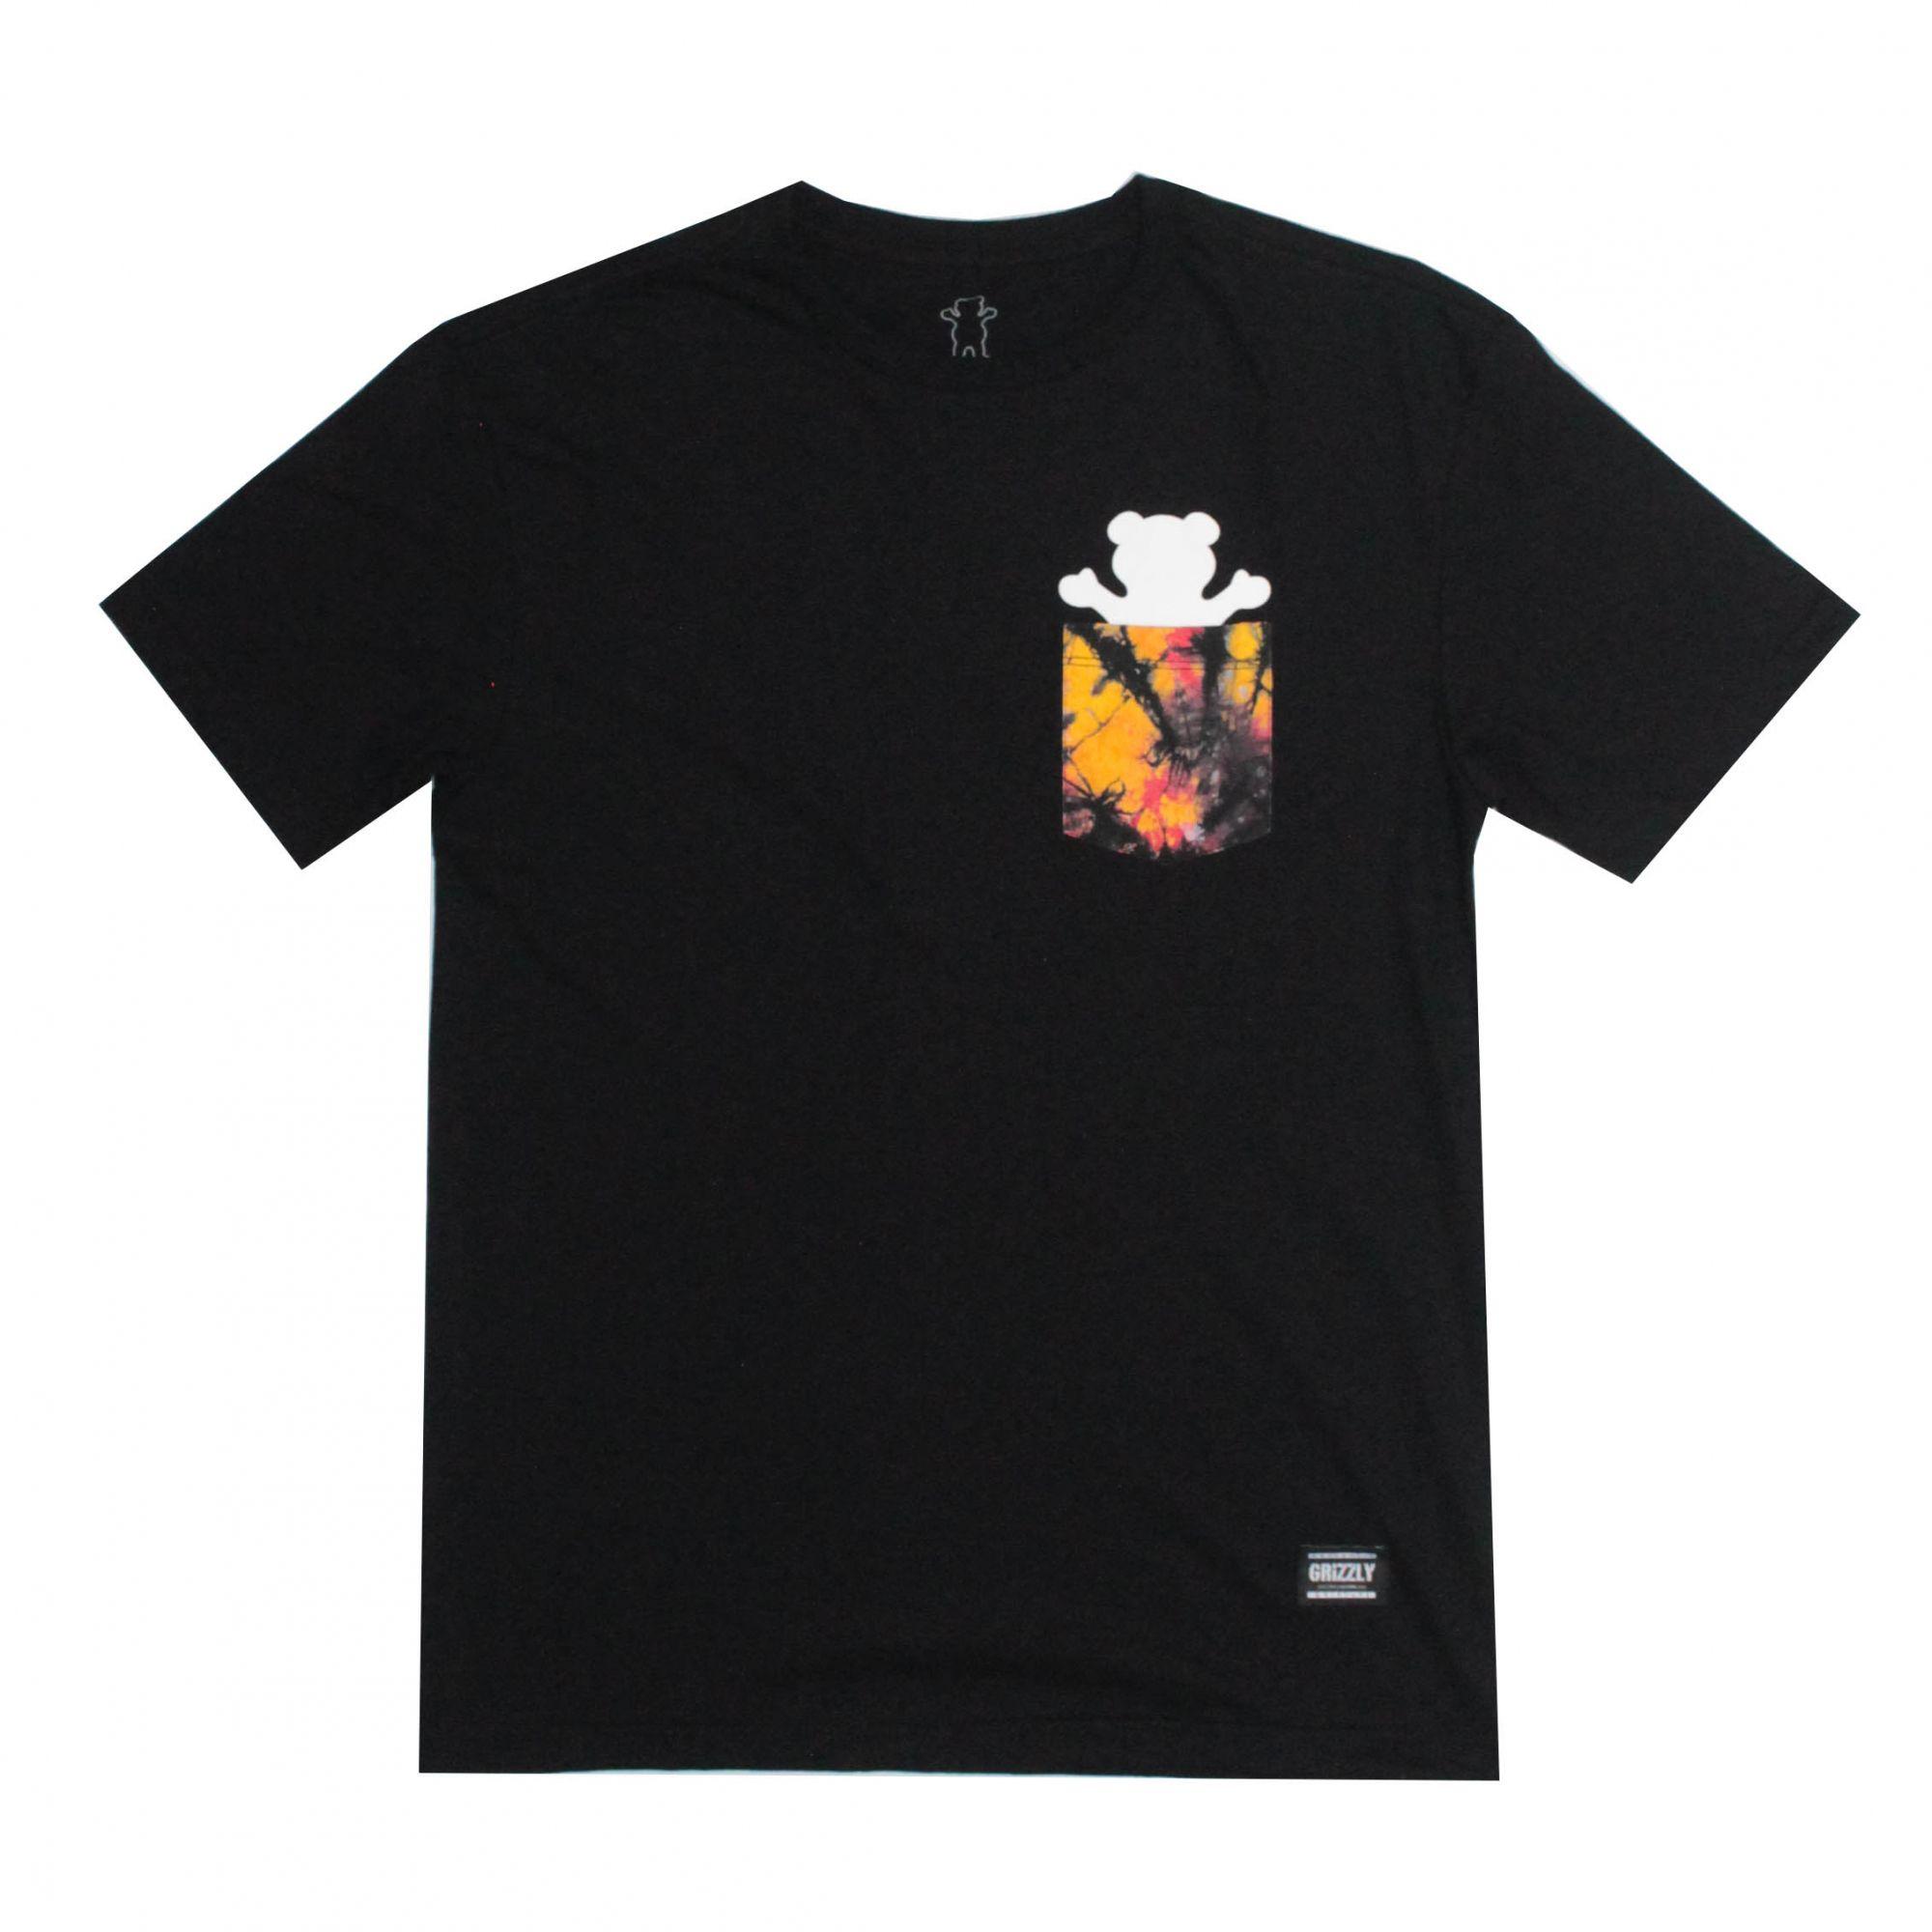 Camiseta Grizzly Bolso Tie Dye Pocket Preto